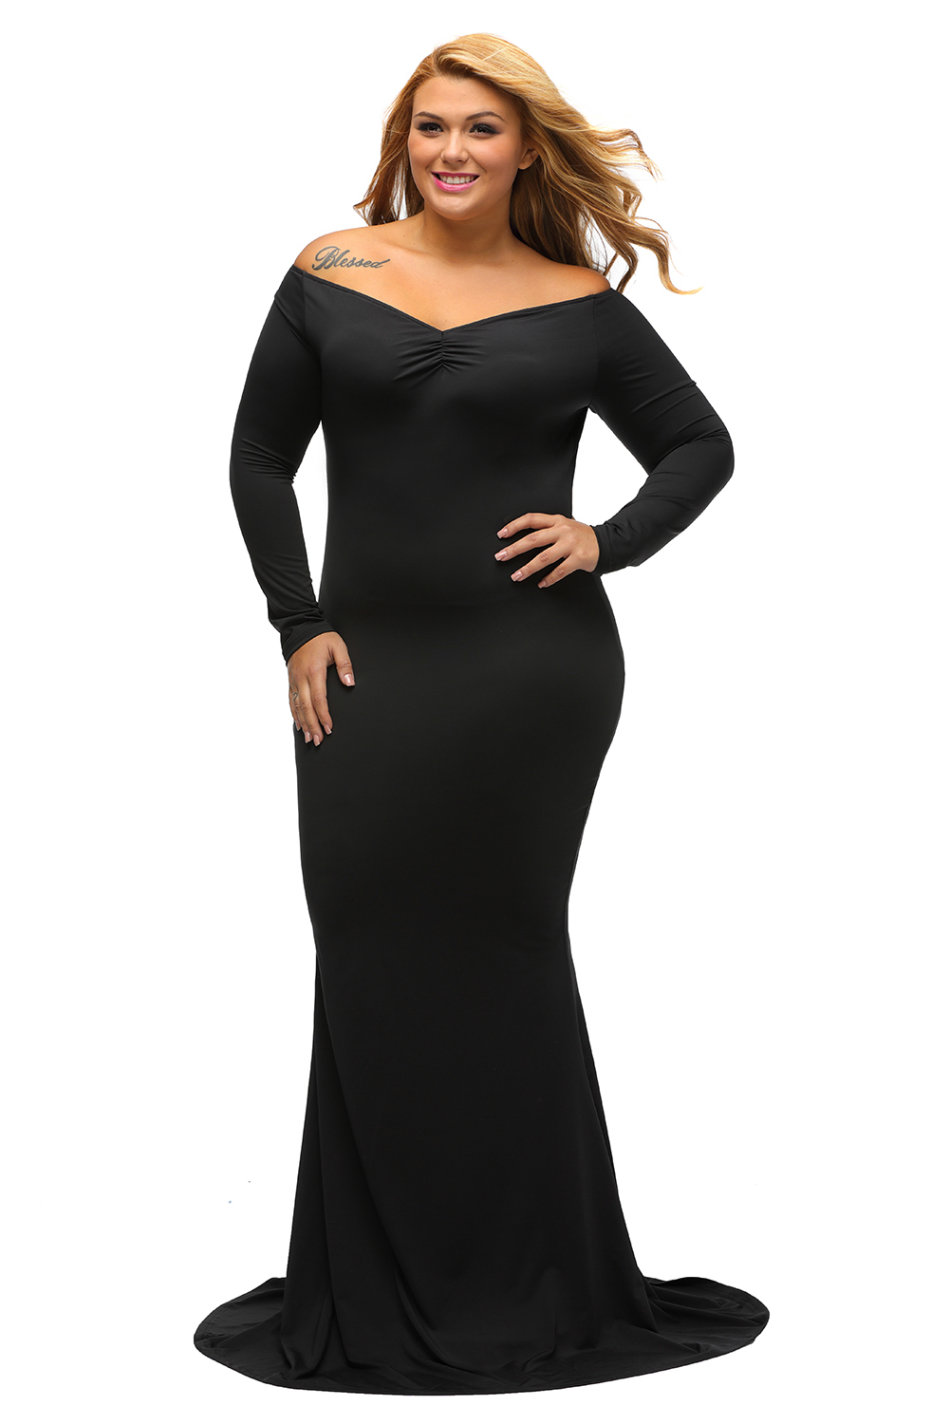 Plus Size Evening Dresses Used | Huston Fislar Photography